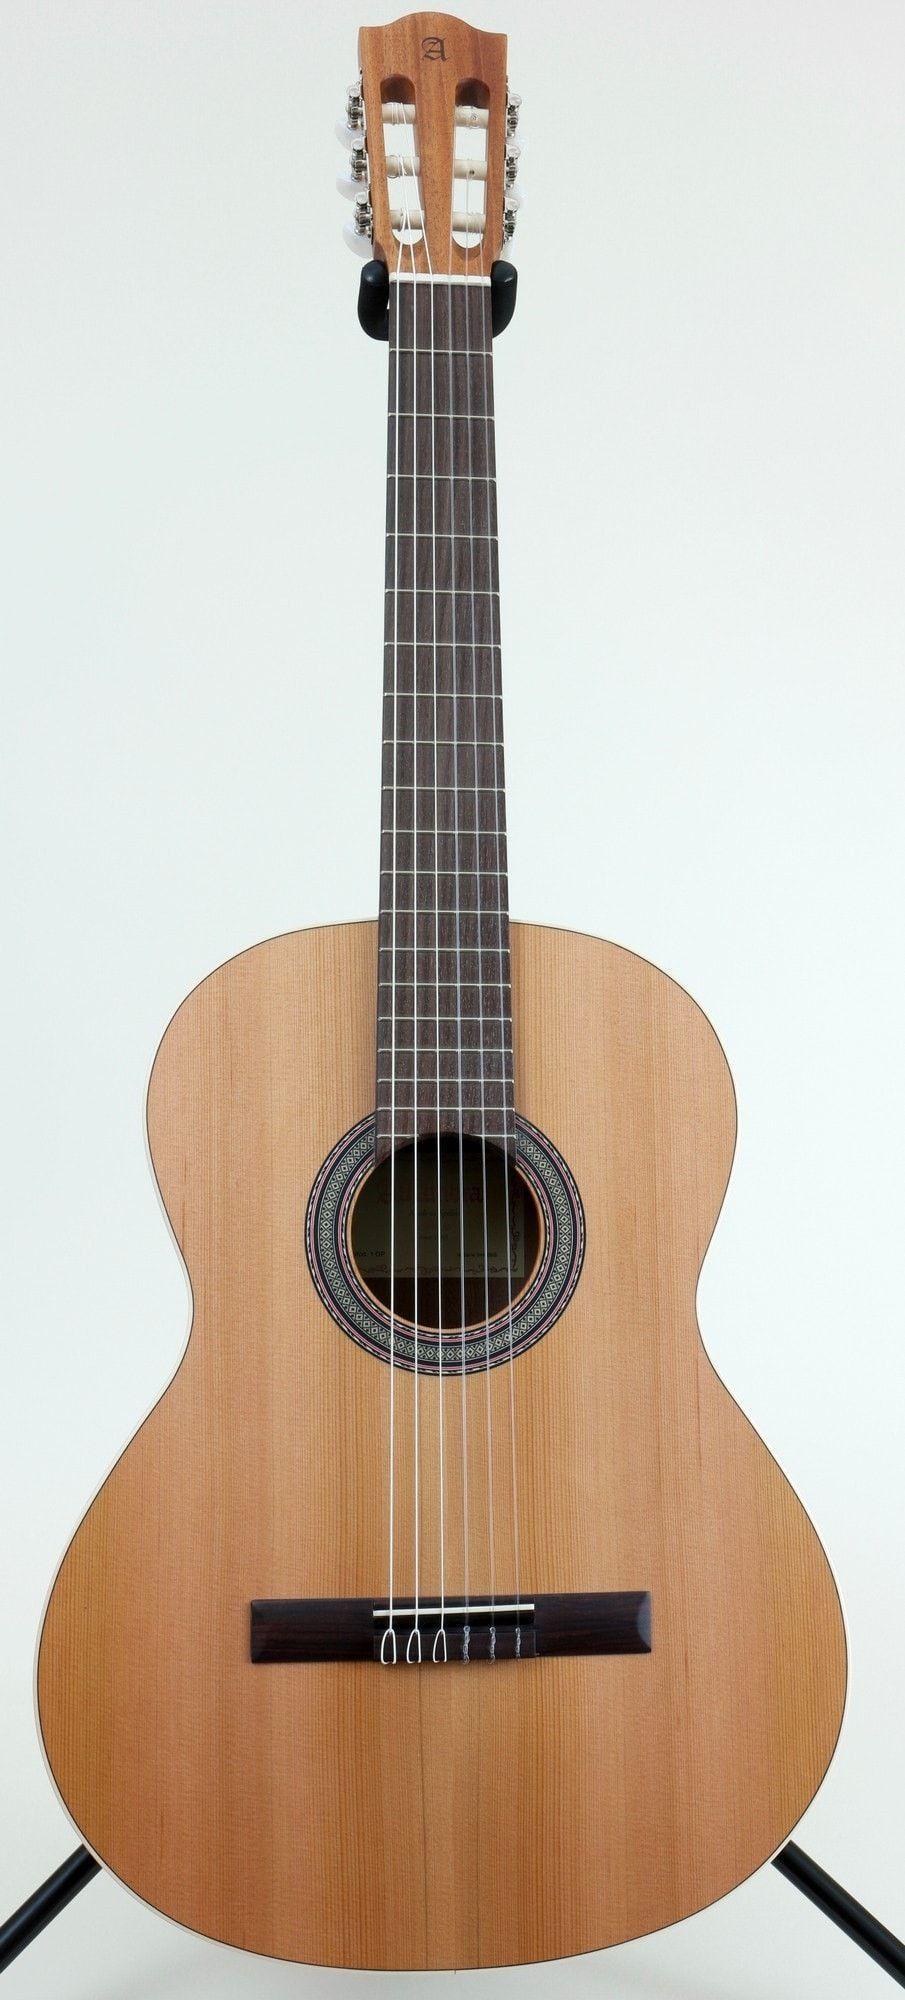 Alhambra 1op Classical Guitar Classical Guitar Classic Guitar Guitar